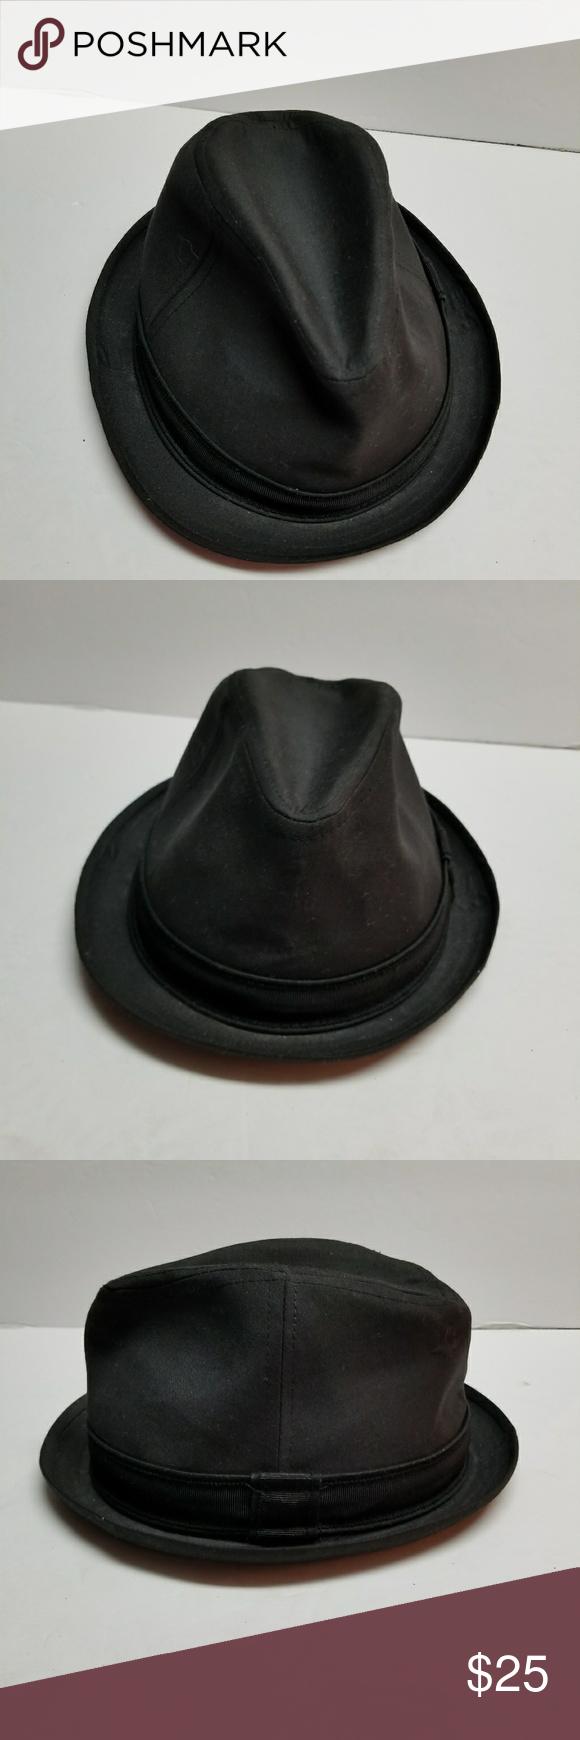 9d91f503487 Vans Fedora Hat Vans Fedora Hat Black 1